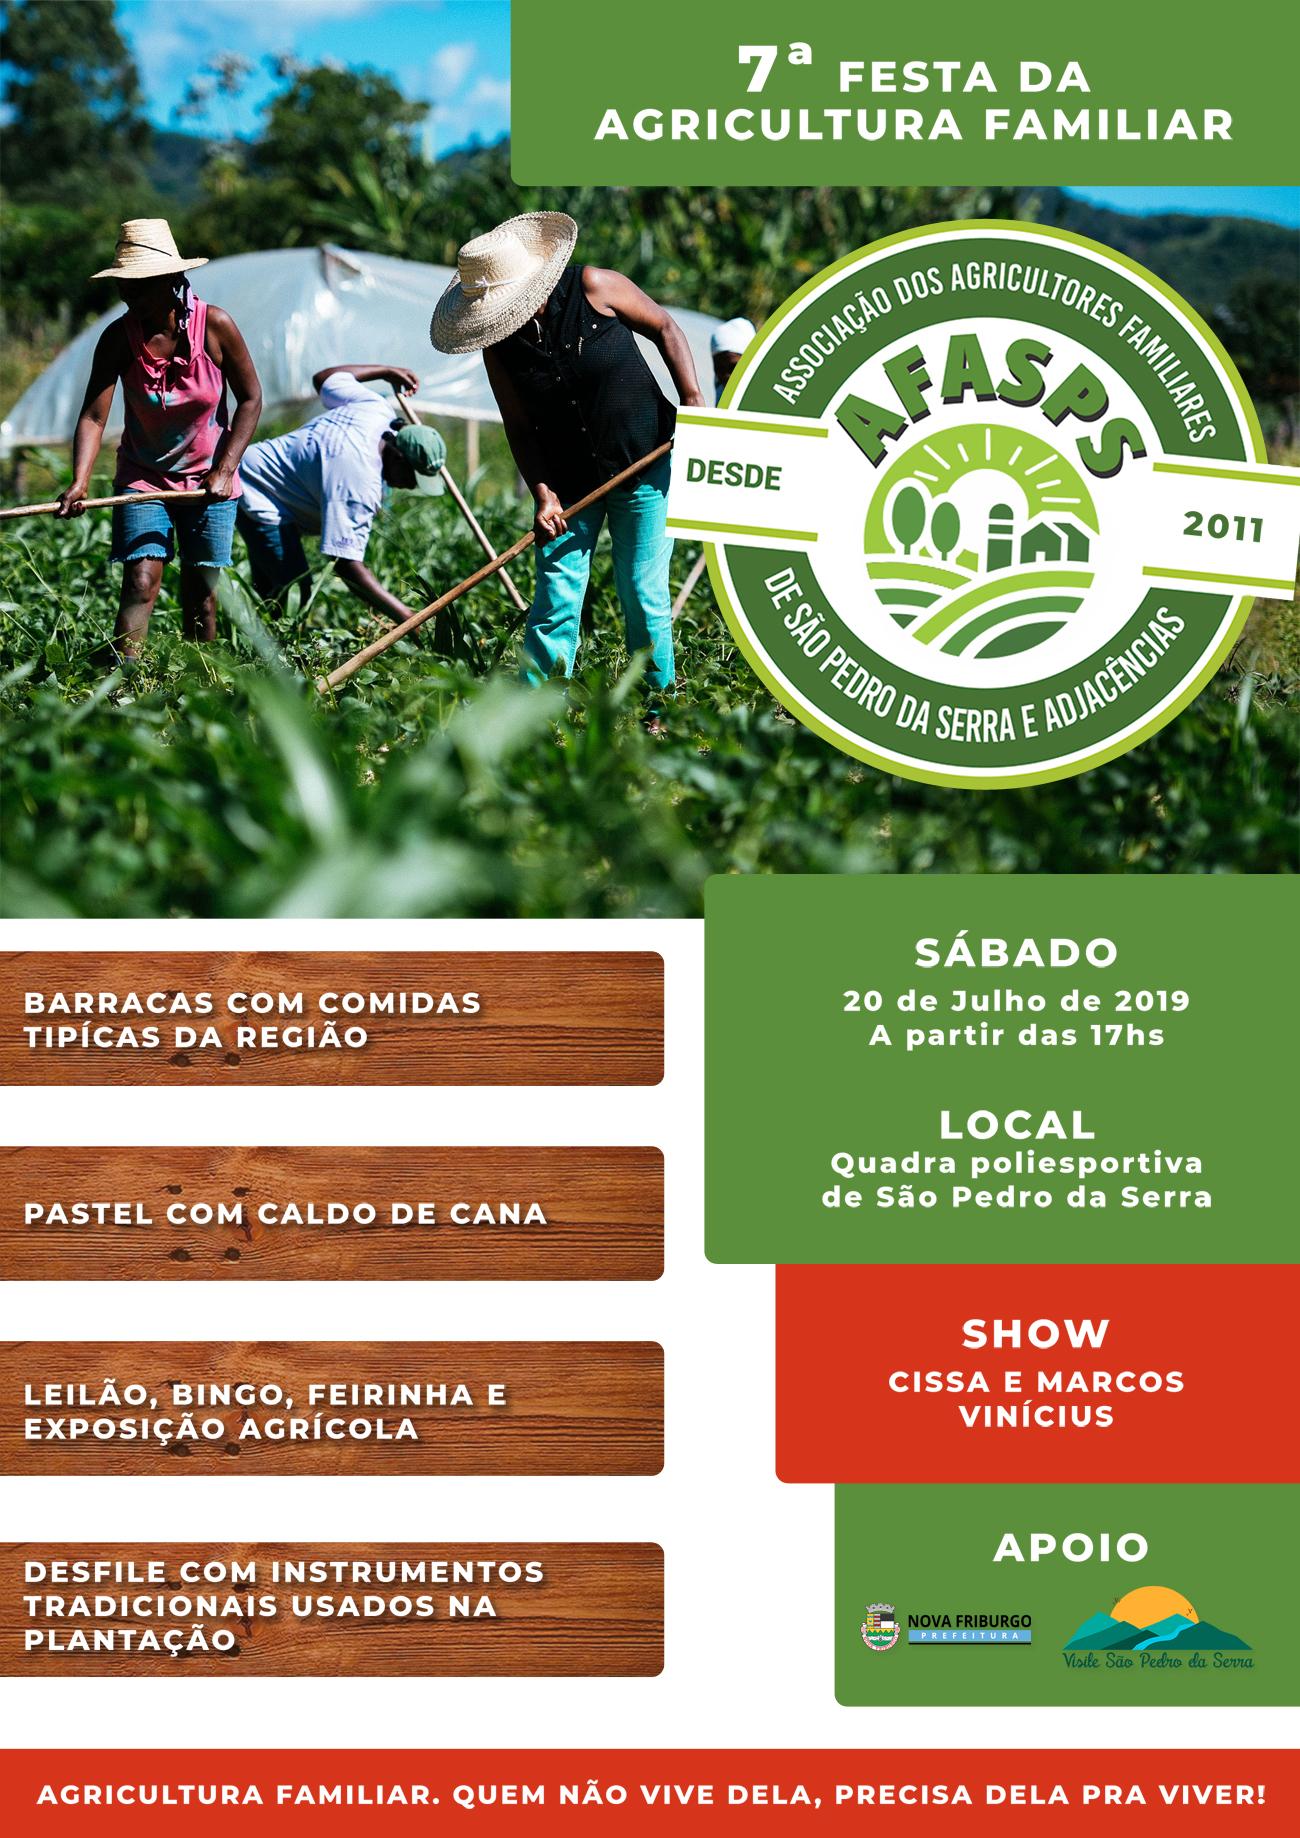 festa-do-agricultor-2019-sao-pedro-da-serra